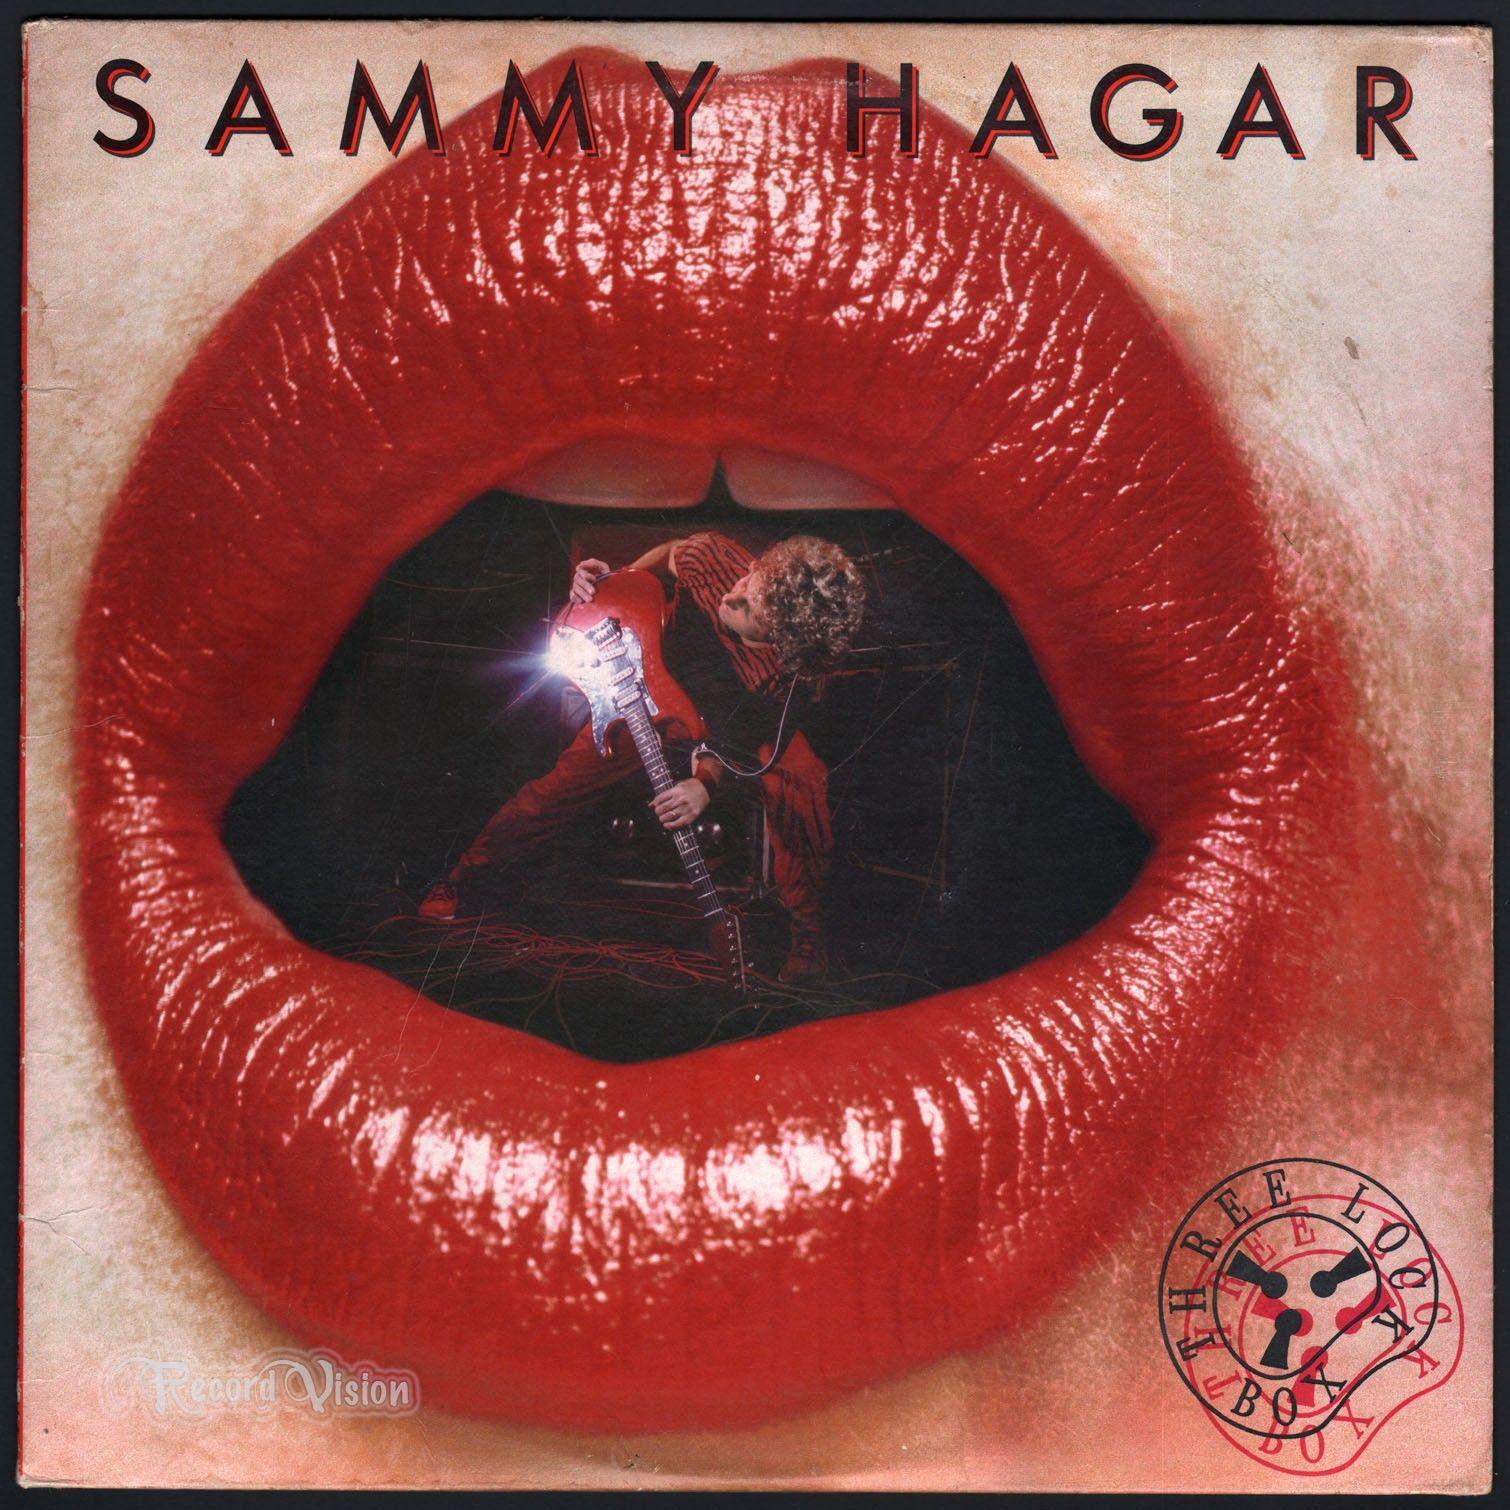 Sammy Hagar Three Lock Box 1982 Ex Ex Rock Album Covers Sammy Hagar Classic Rock Albums